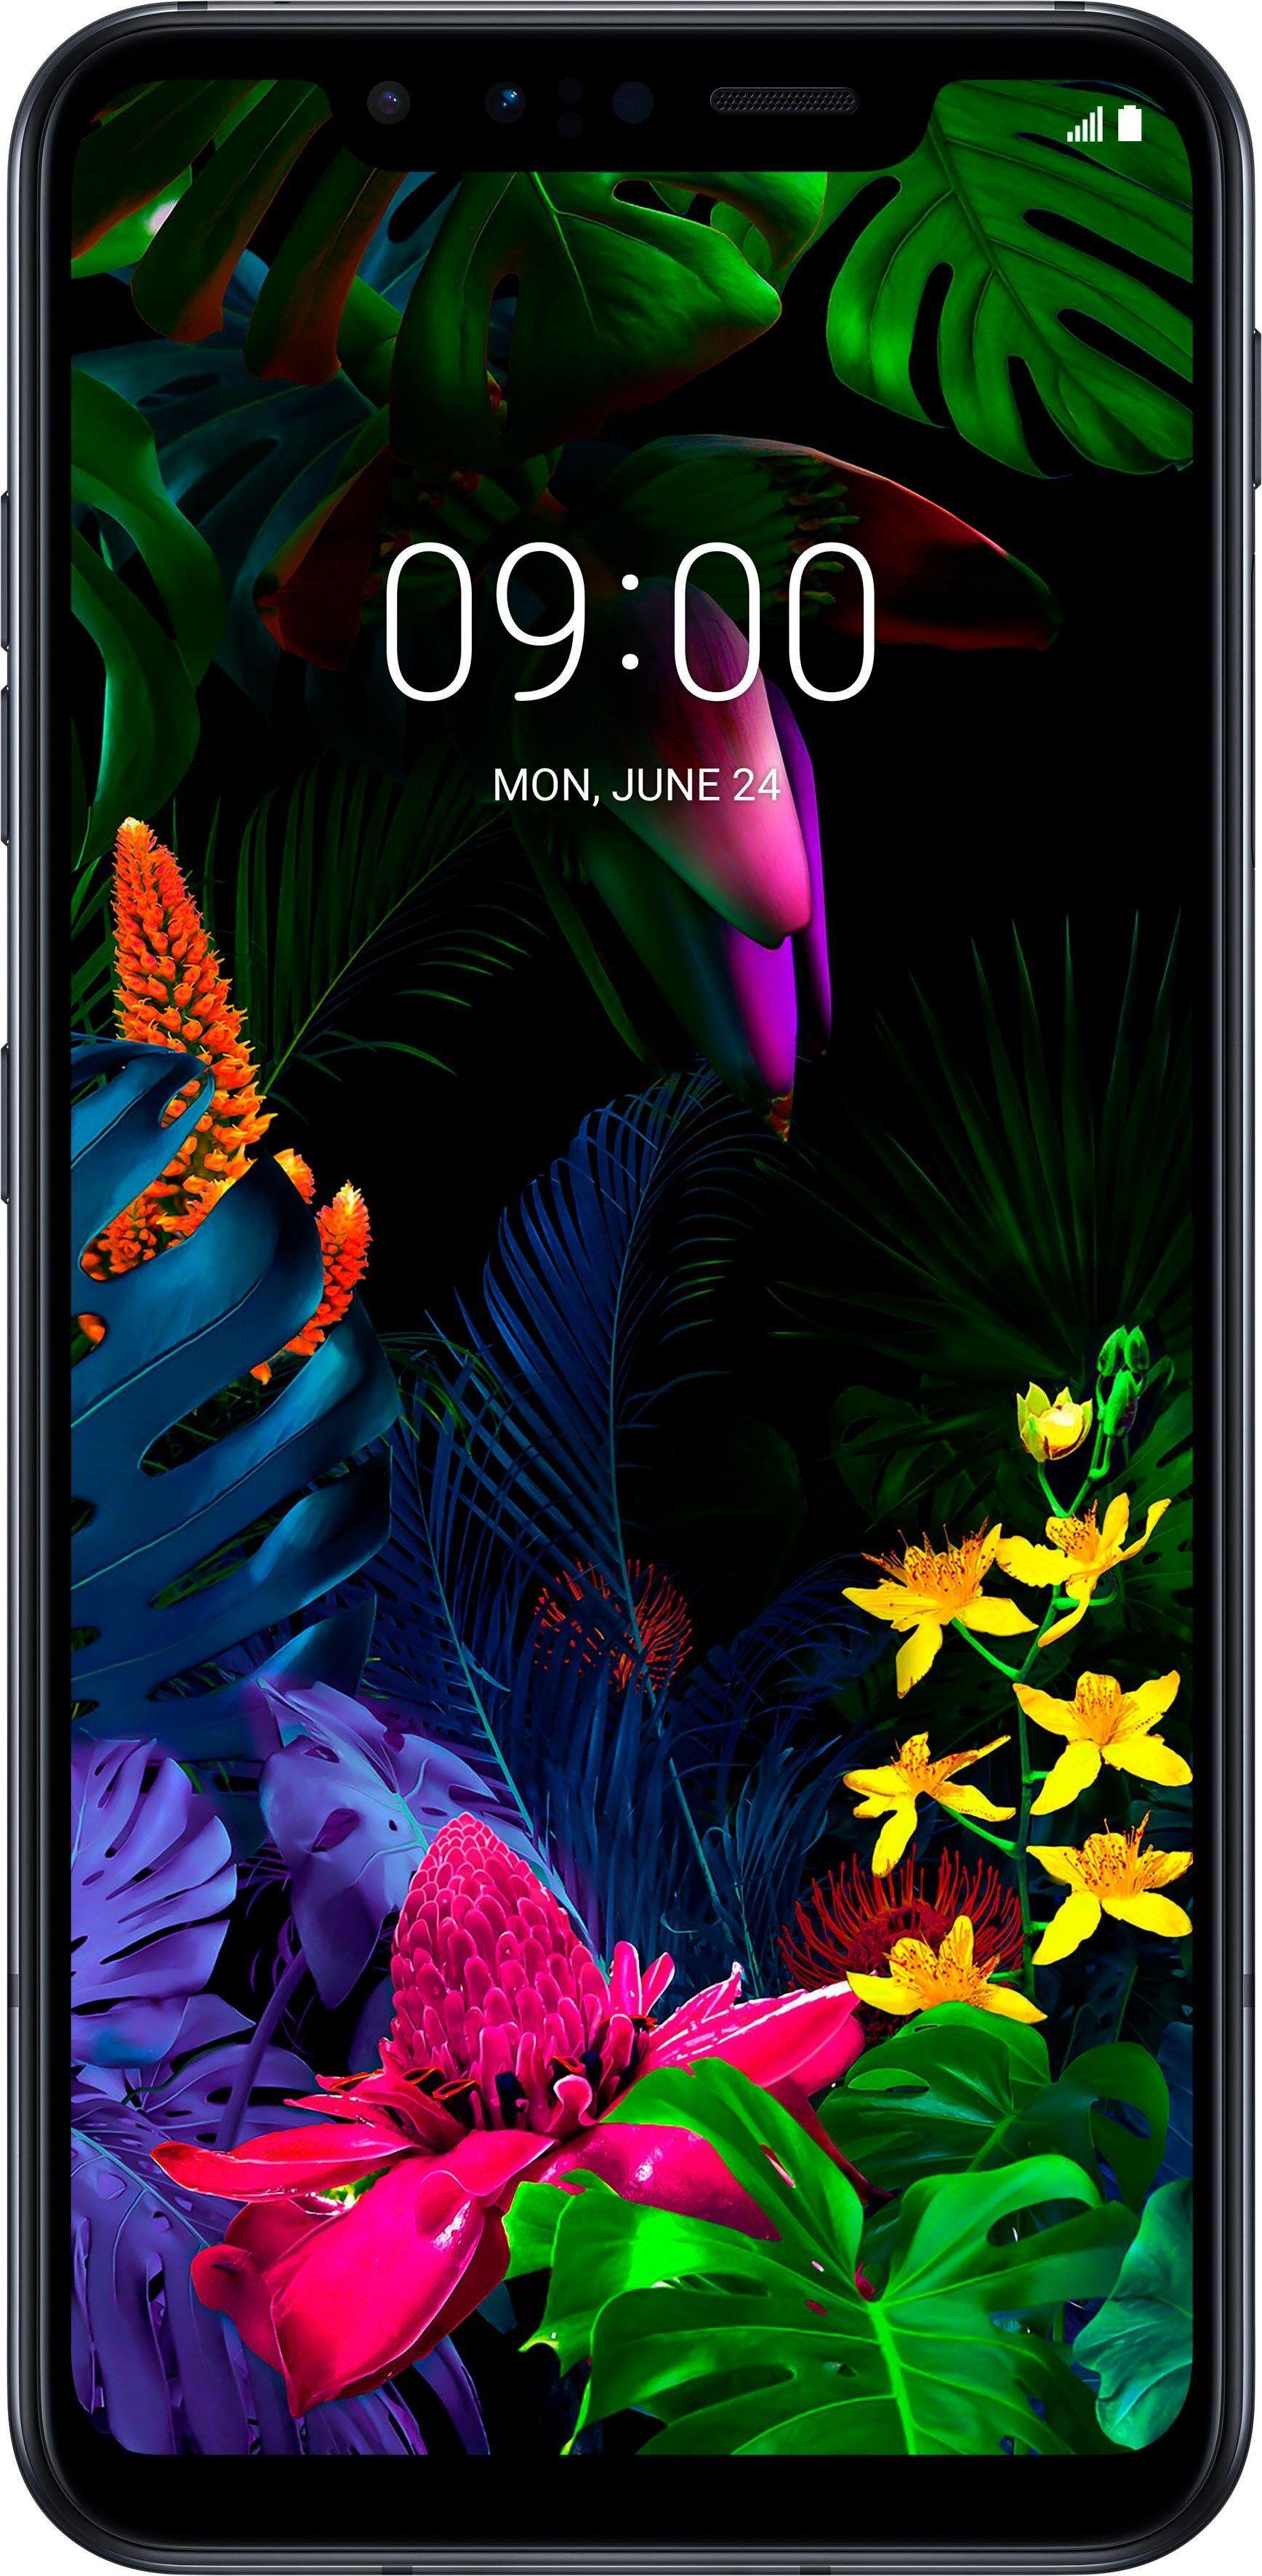 LG G8s ThinQ Smartphone (15,74 cm/6,2 Zoll, 128 GB Speicherplatz, 12 MP Kamera), mirror black